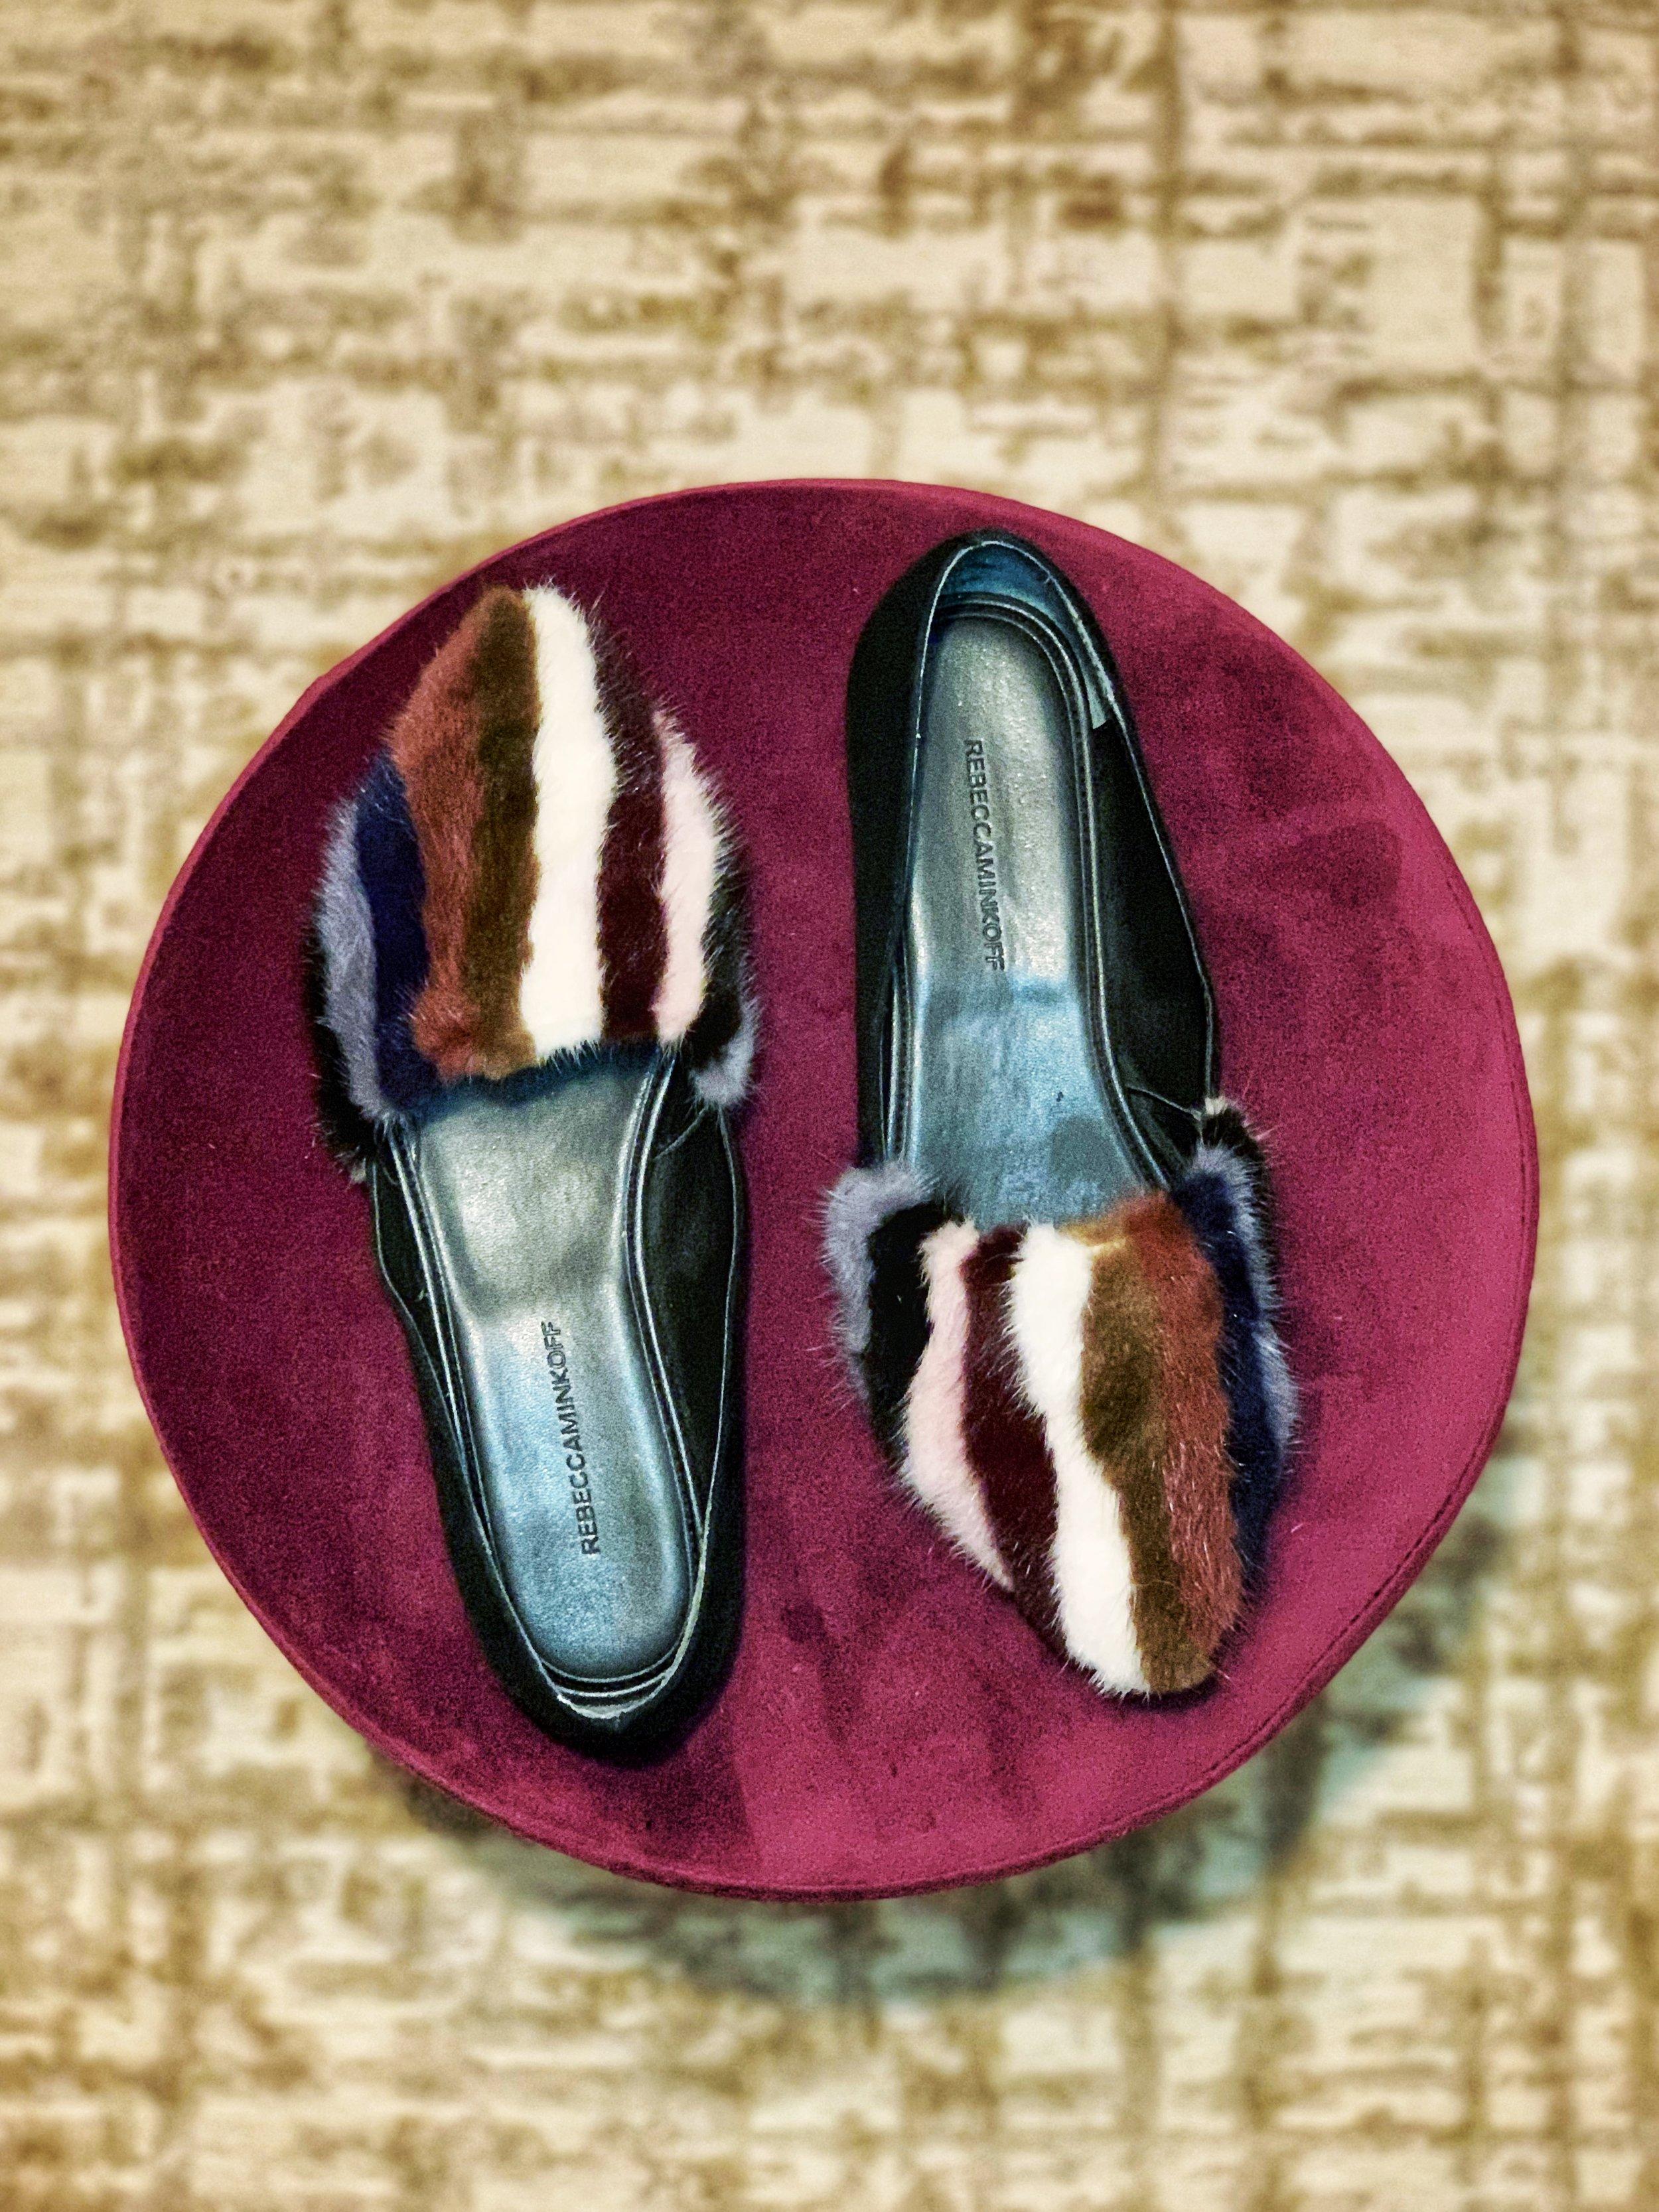 Shoes: Rebecca Minkoff on    eBay    and    Amazon